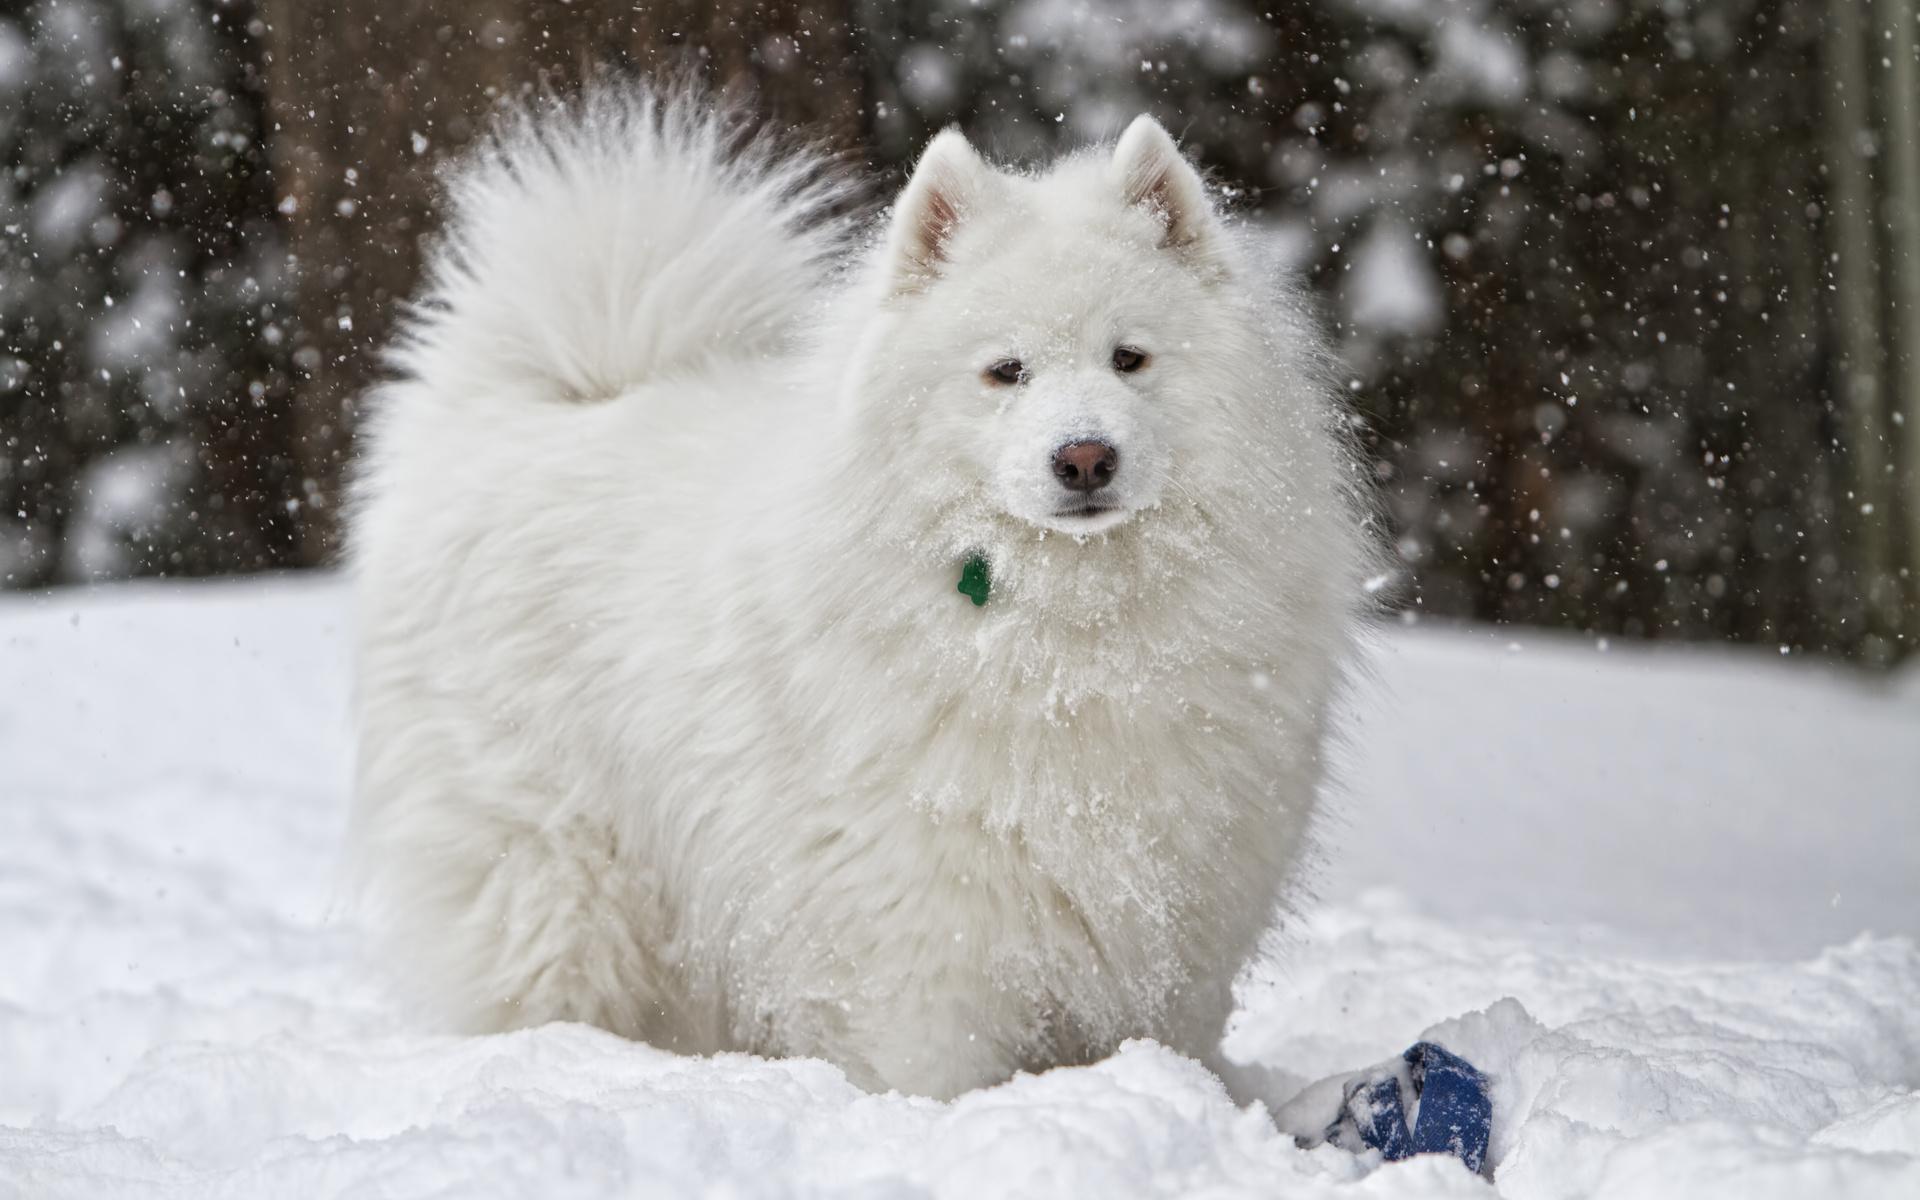 Dog snow white winter wallpaper 1920x1200 75100 WallpaperUP 1920x1200